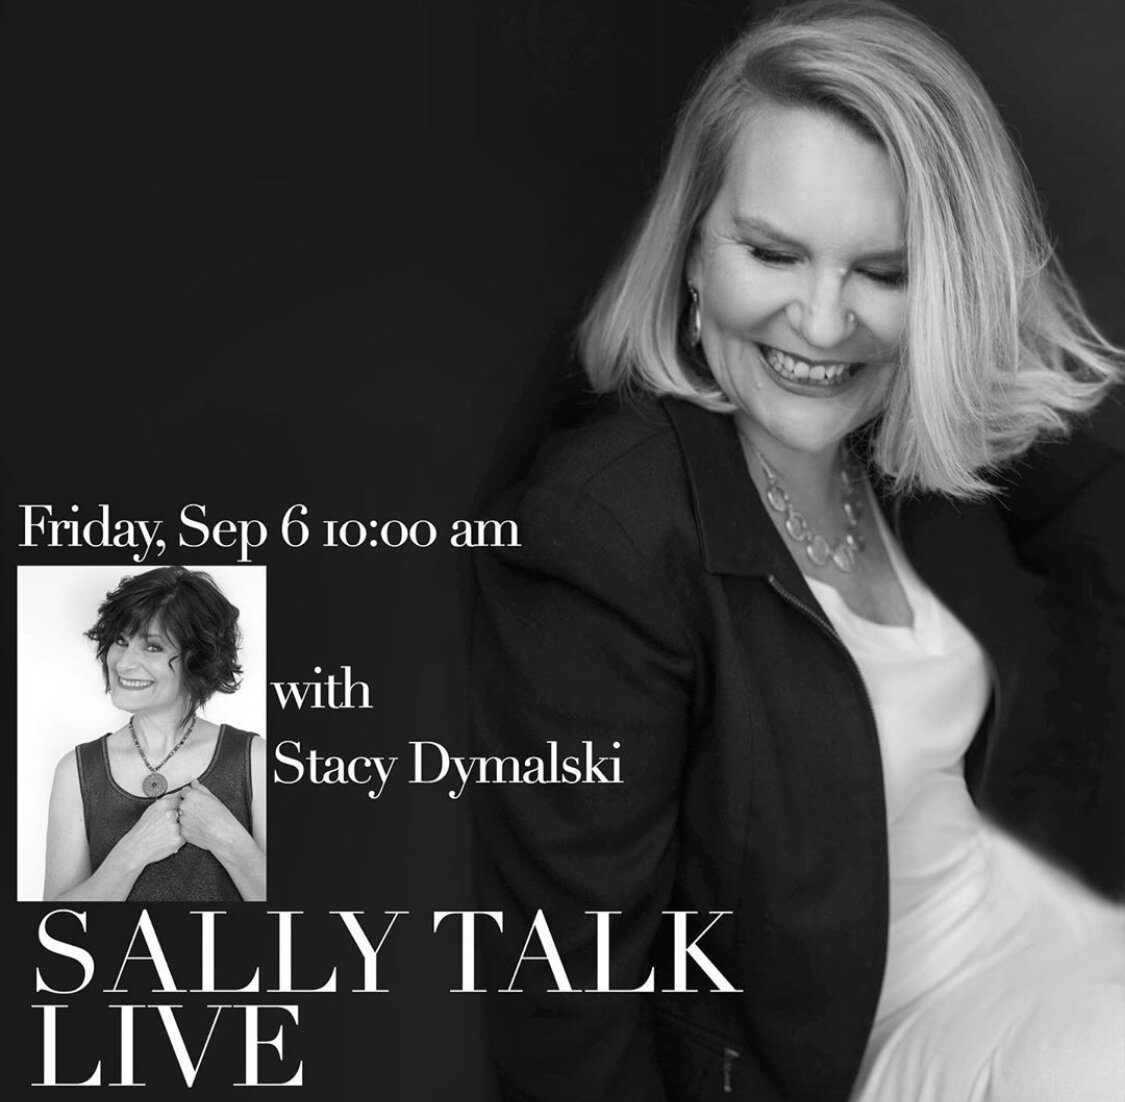 Sally Talk Image.jpg